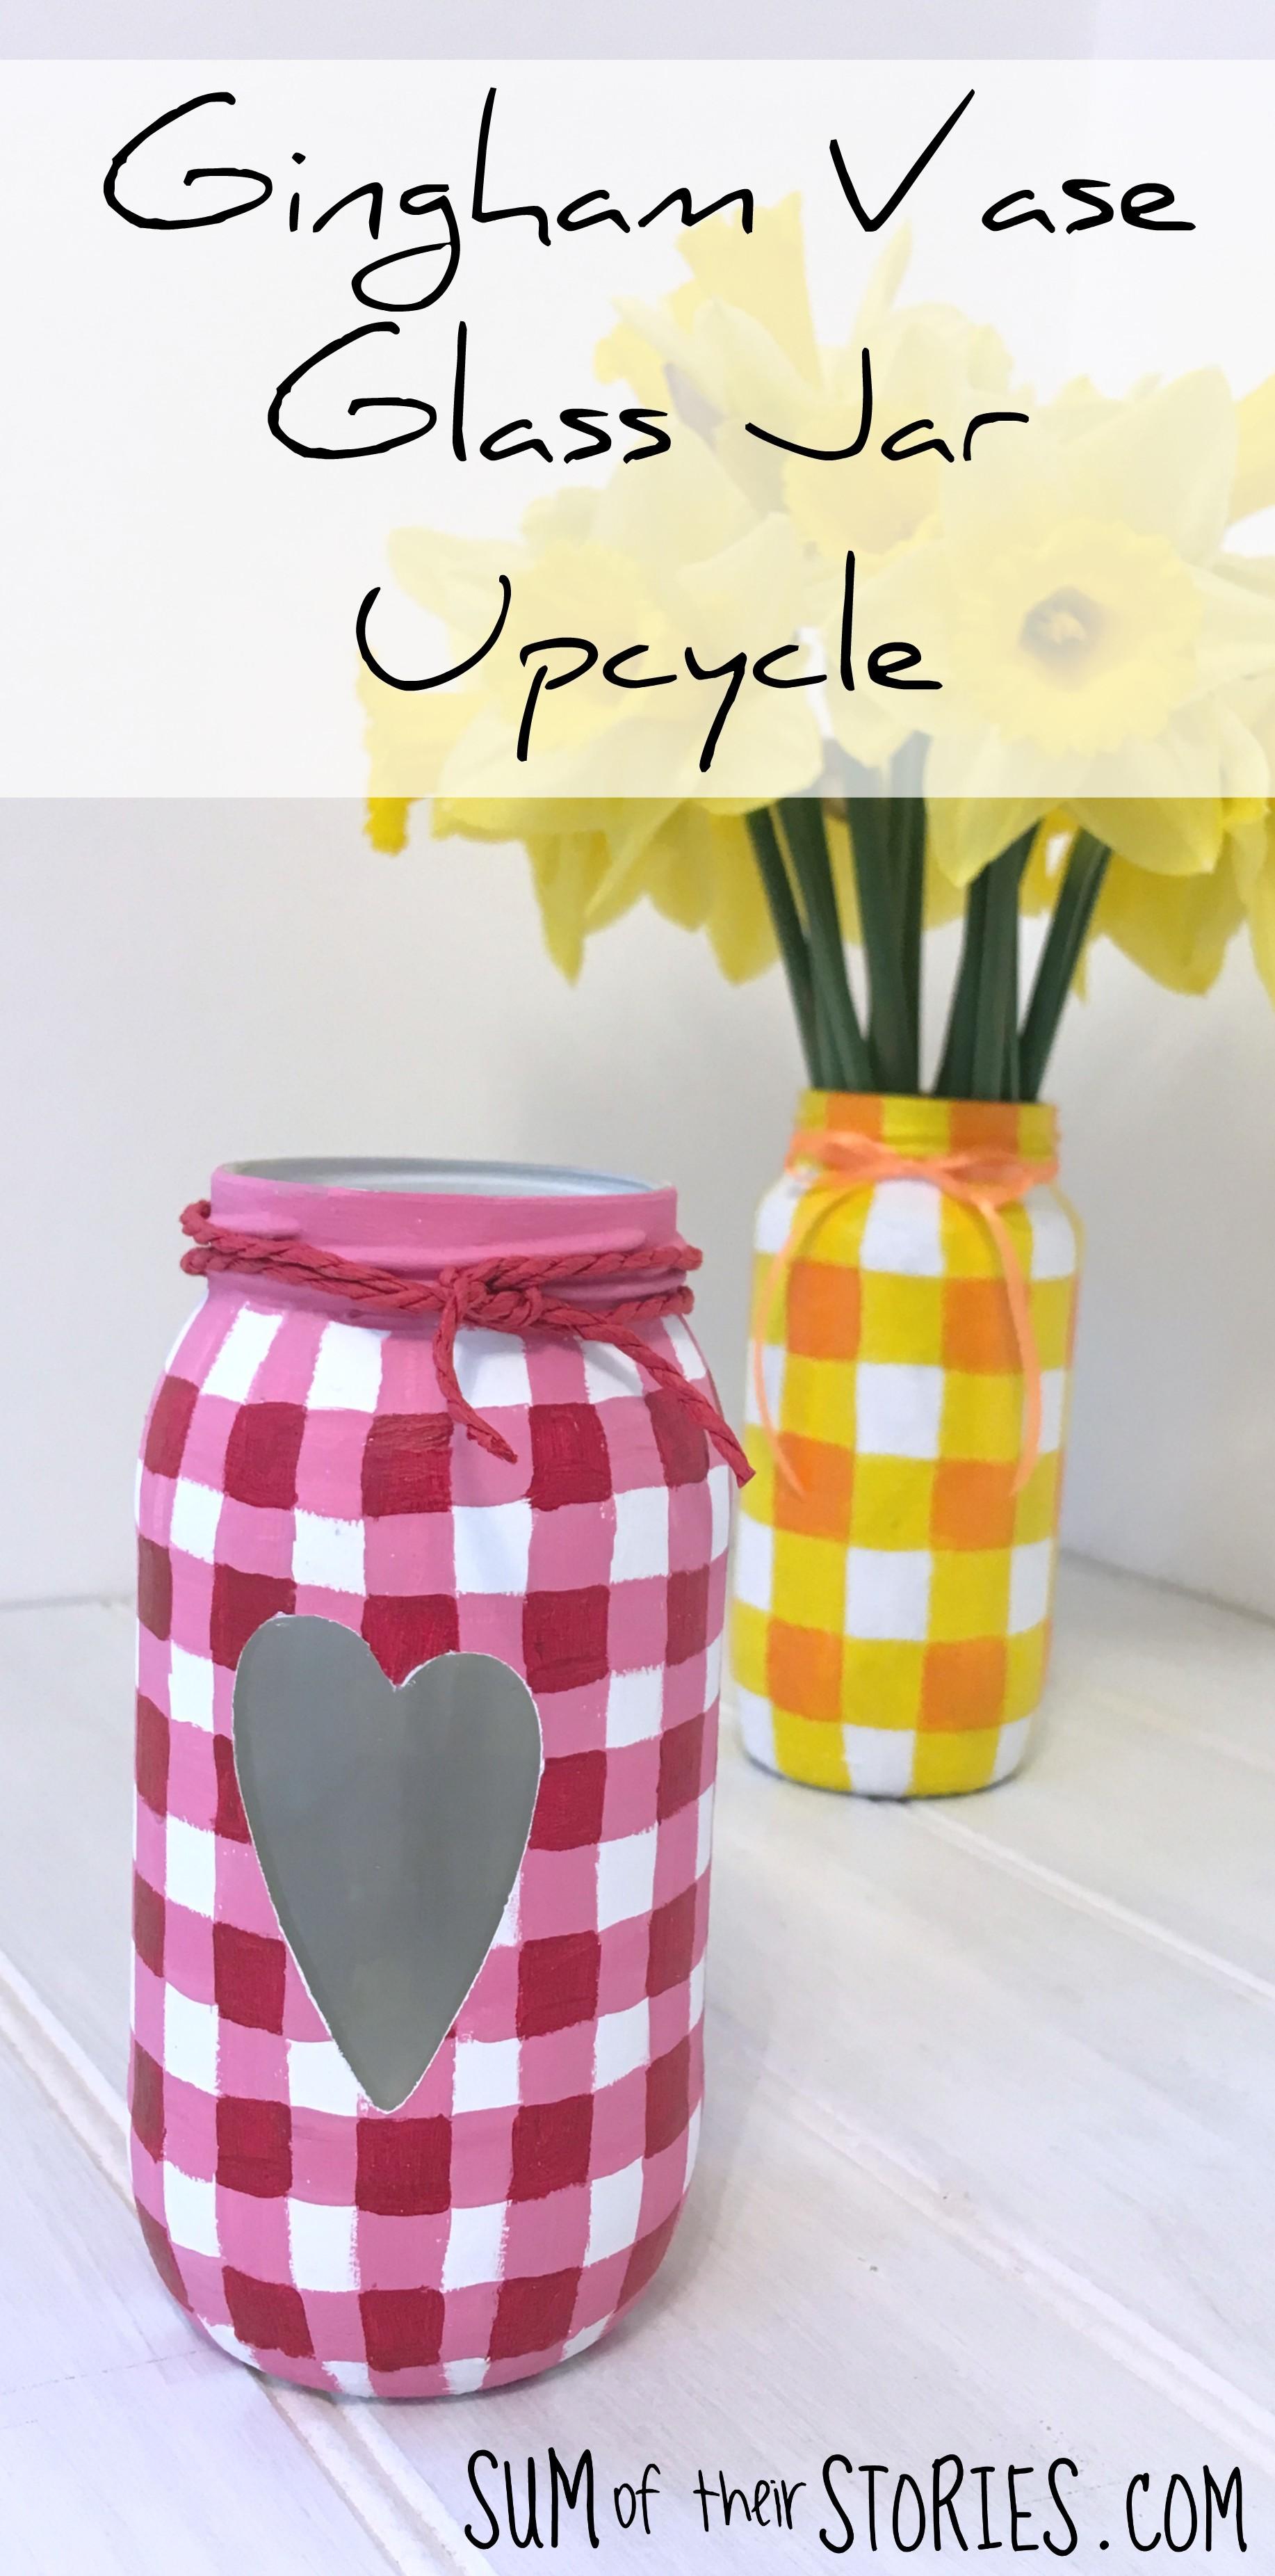 Gingham Vase glass jar upcyle